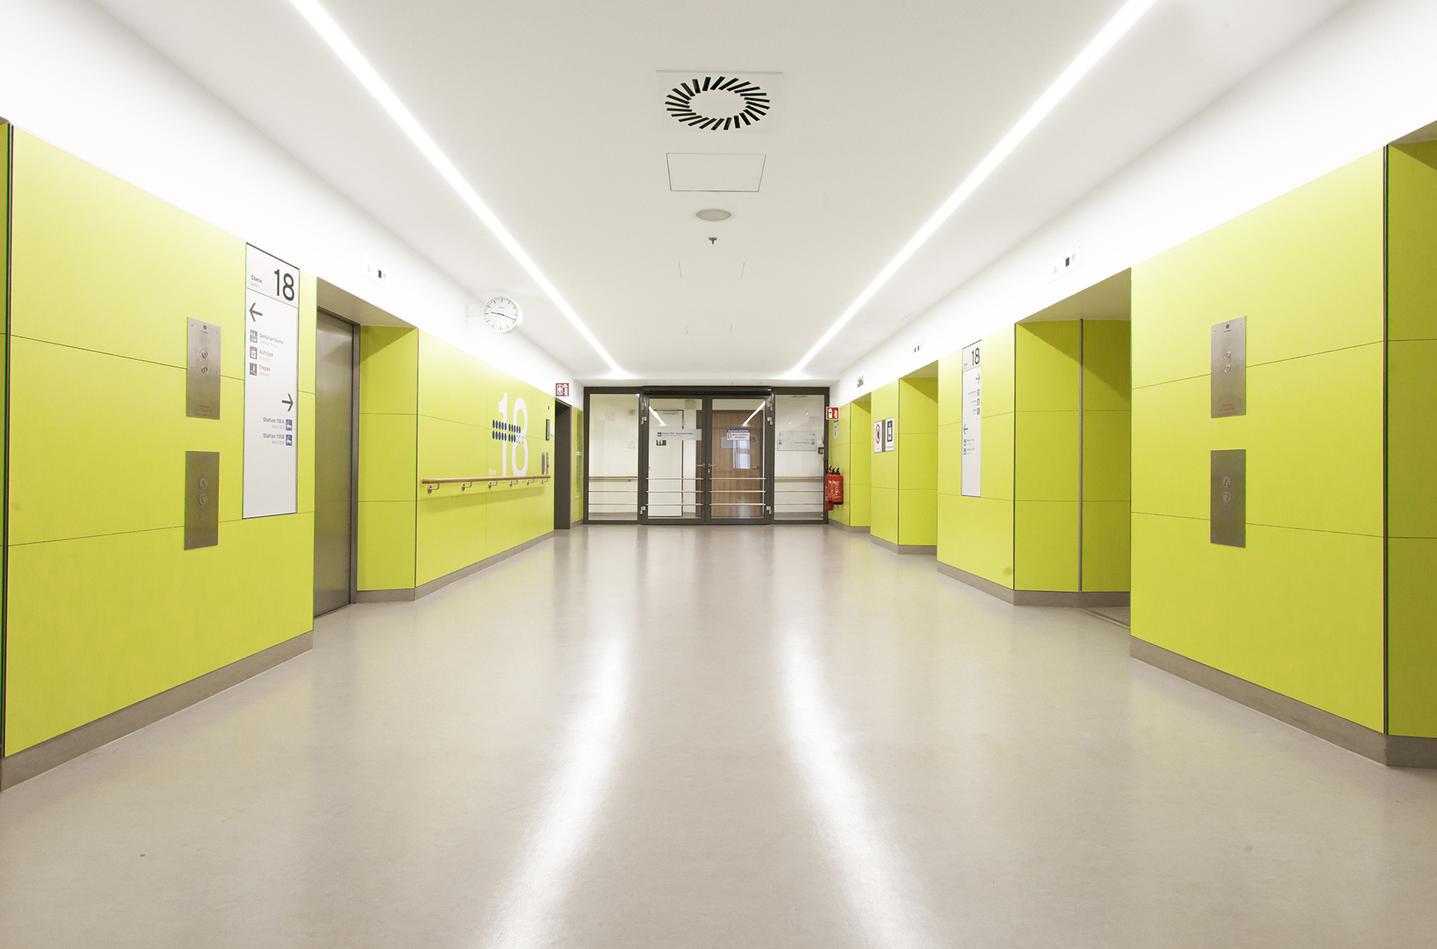 Leitfahiger Linoleum Bodenbelag Conductive Xf Naturlicher Und